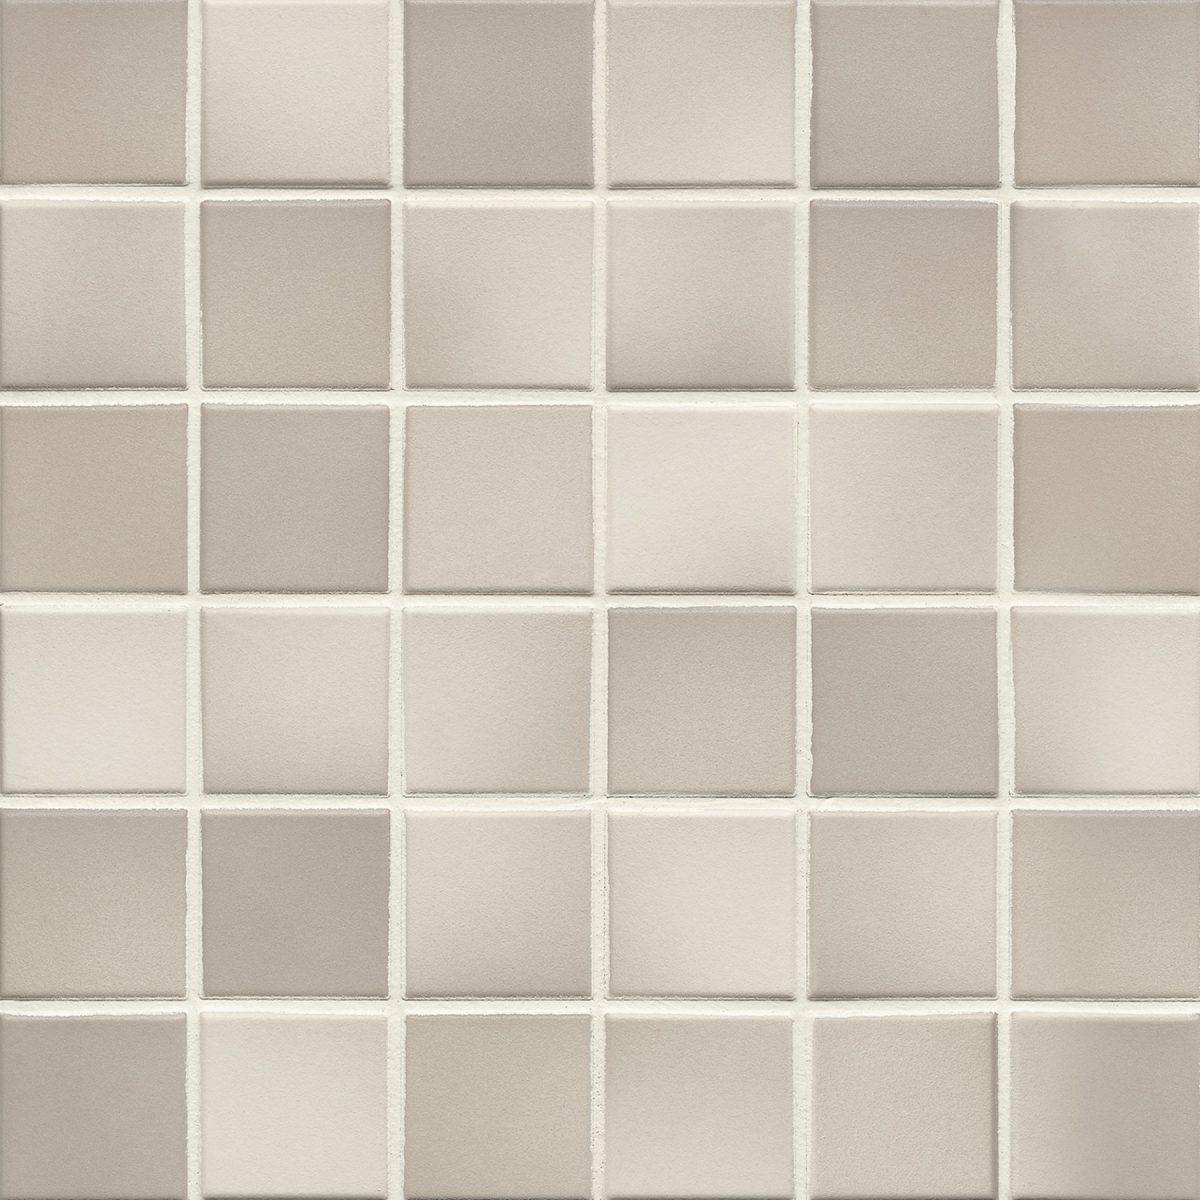 Мозаика серия Fresh 5,0 X 5,0 см Sand Mix Secura (противоскользящая R10/B)